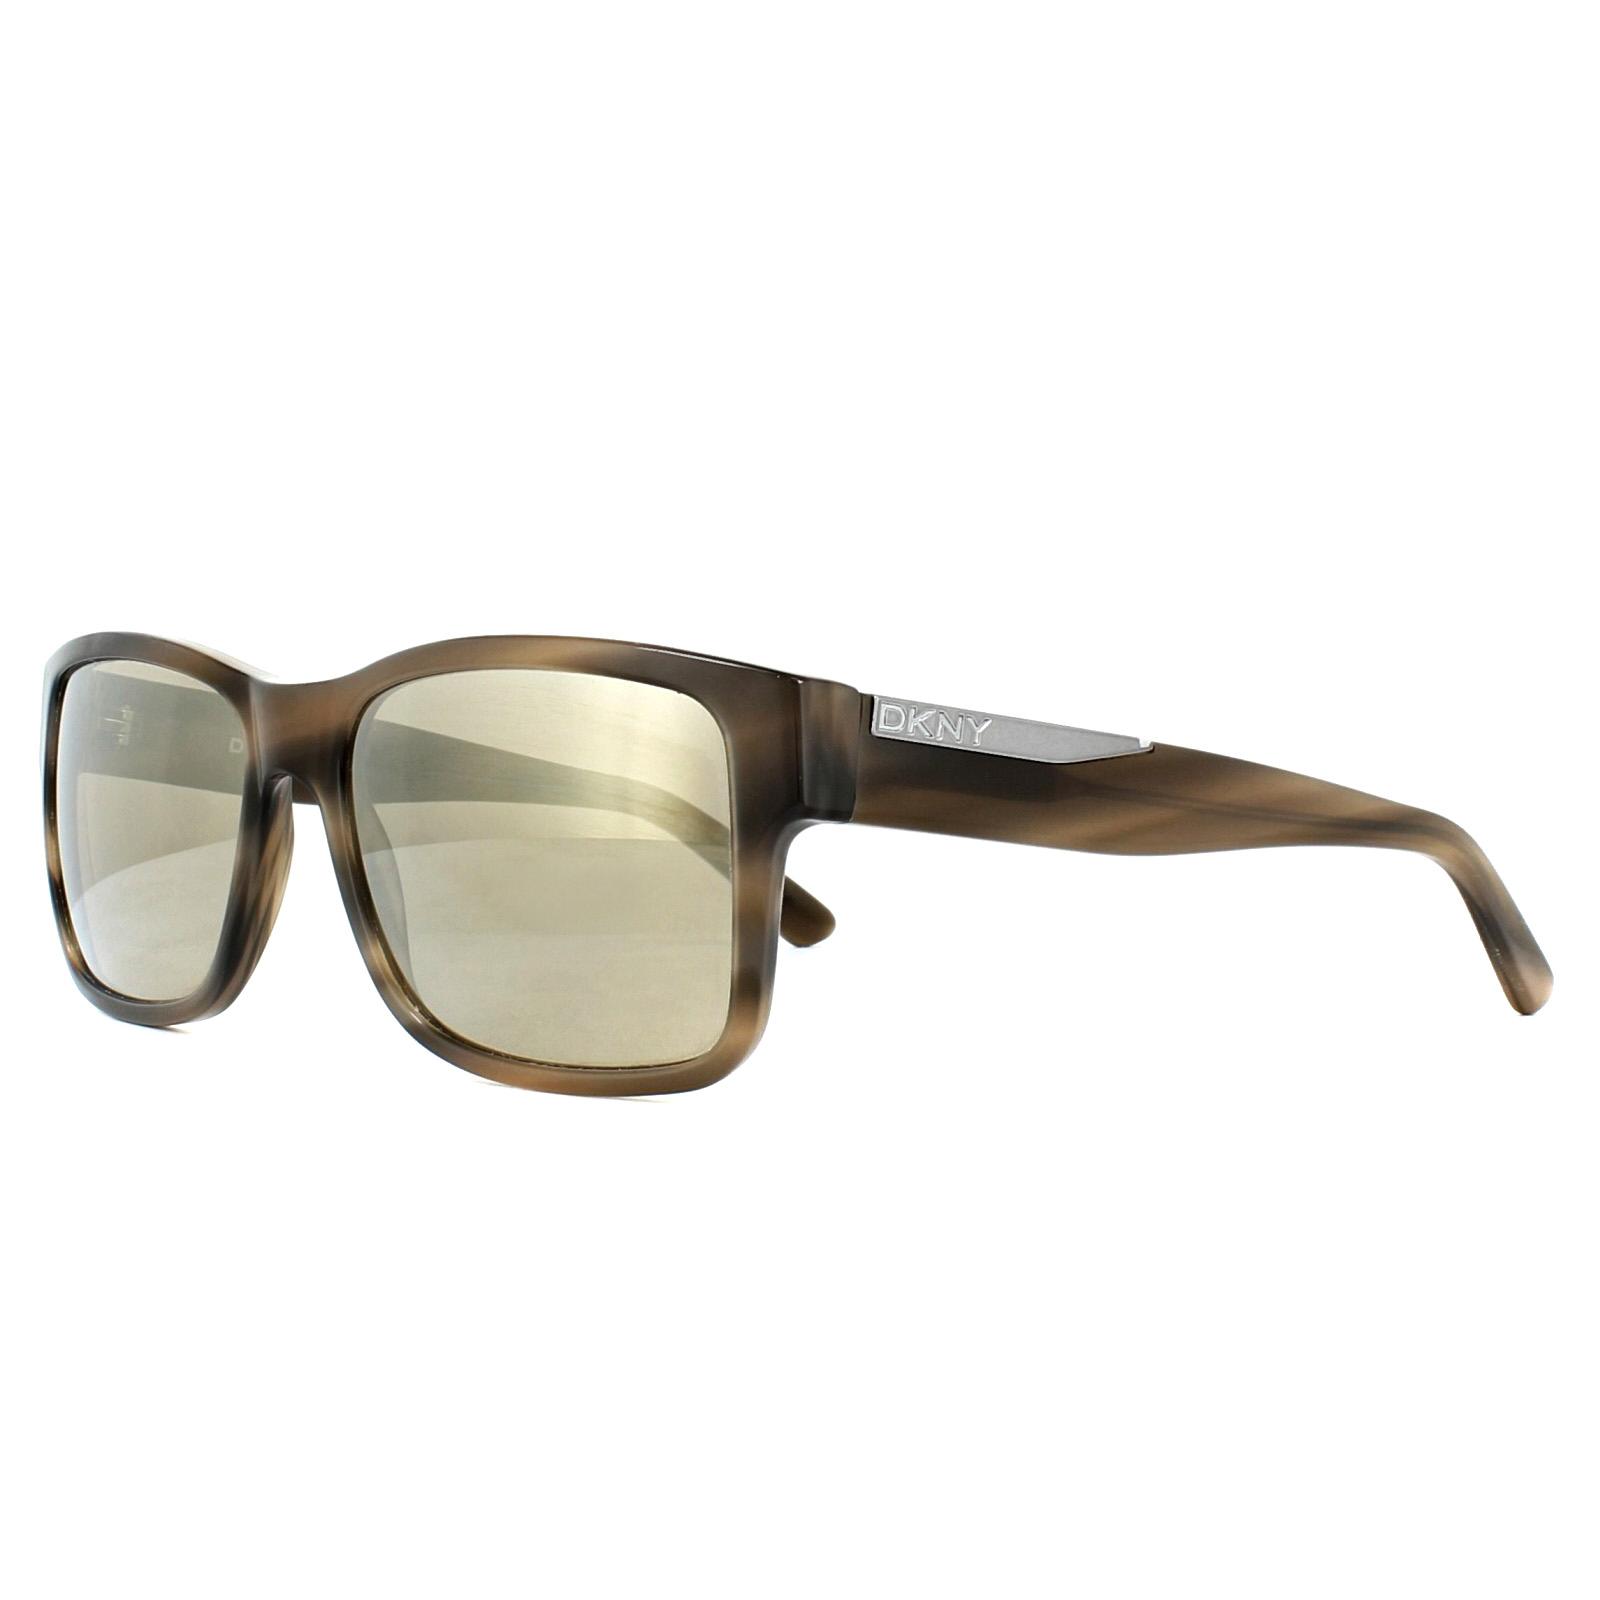 c95094141902 Cheap DKNY 4108 Sunglasses - Discounted Sunglasses